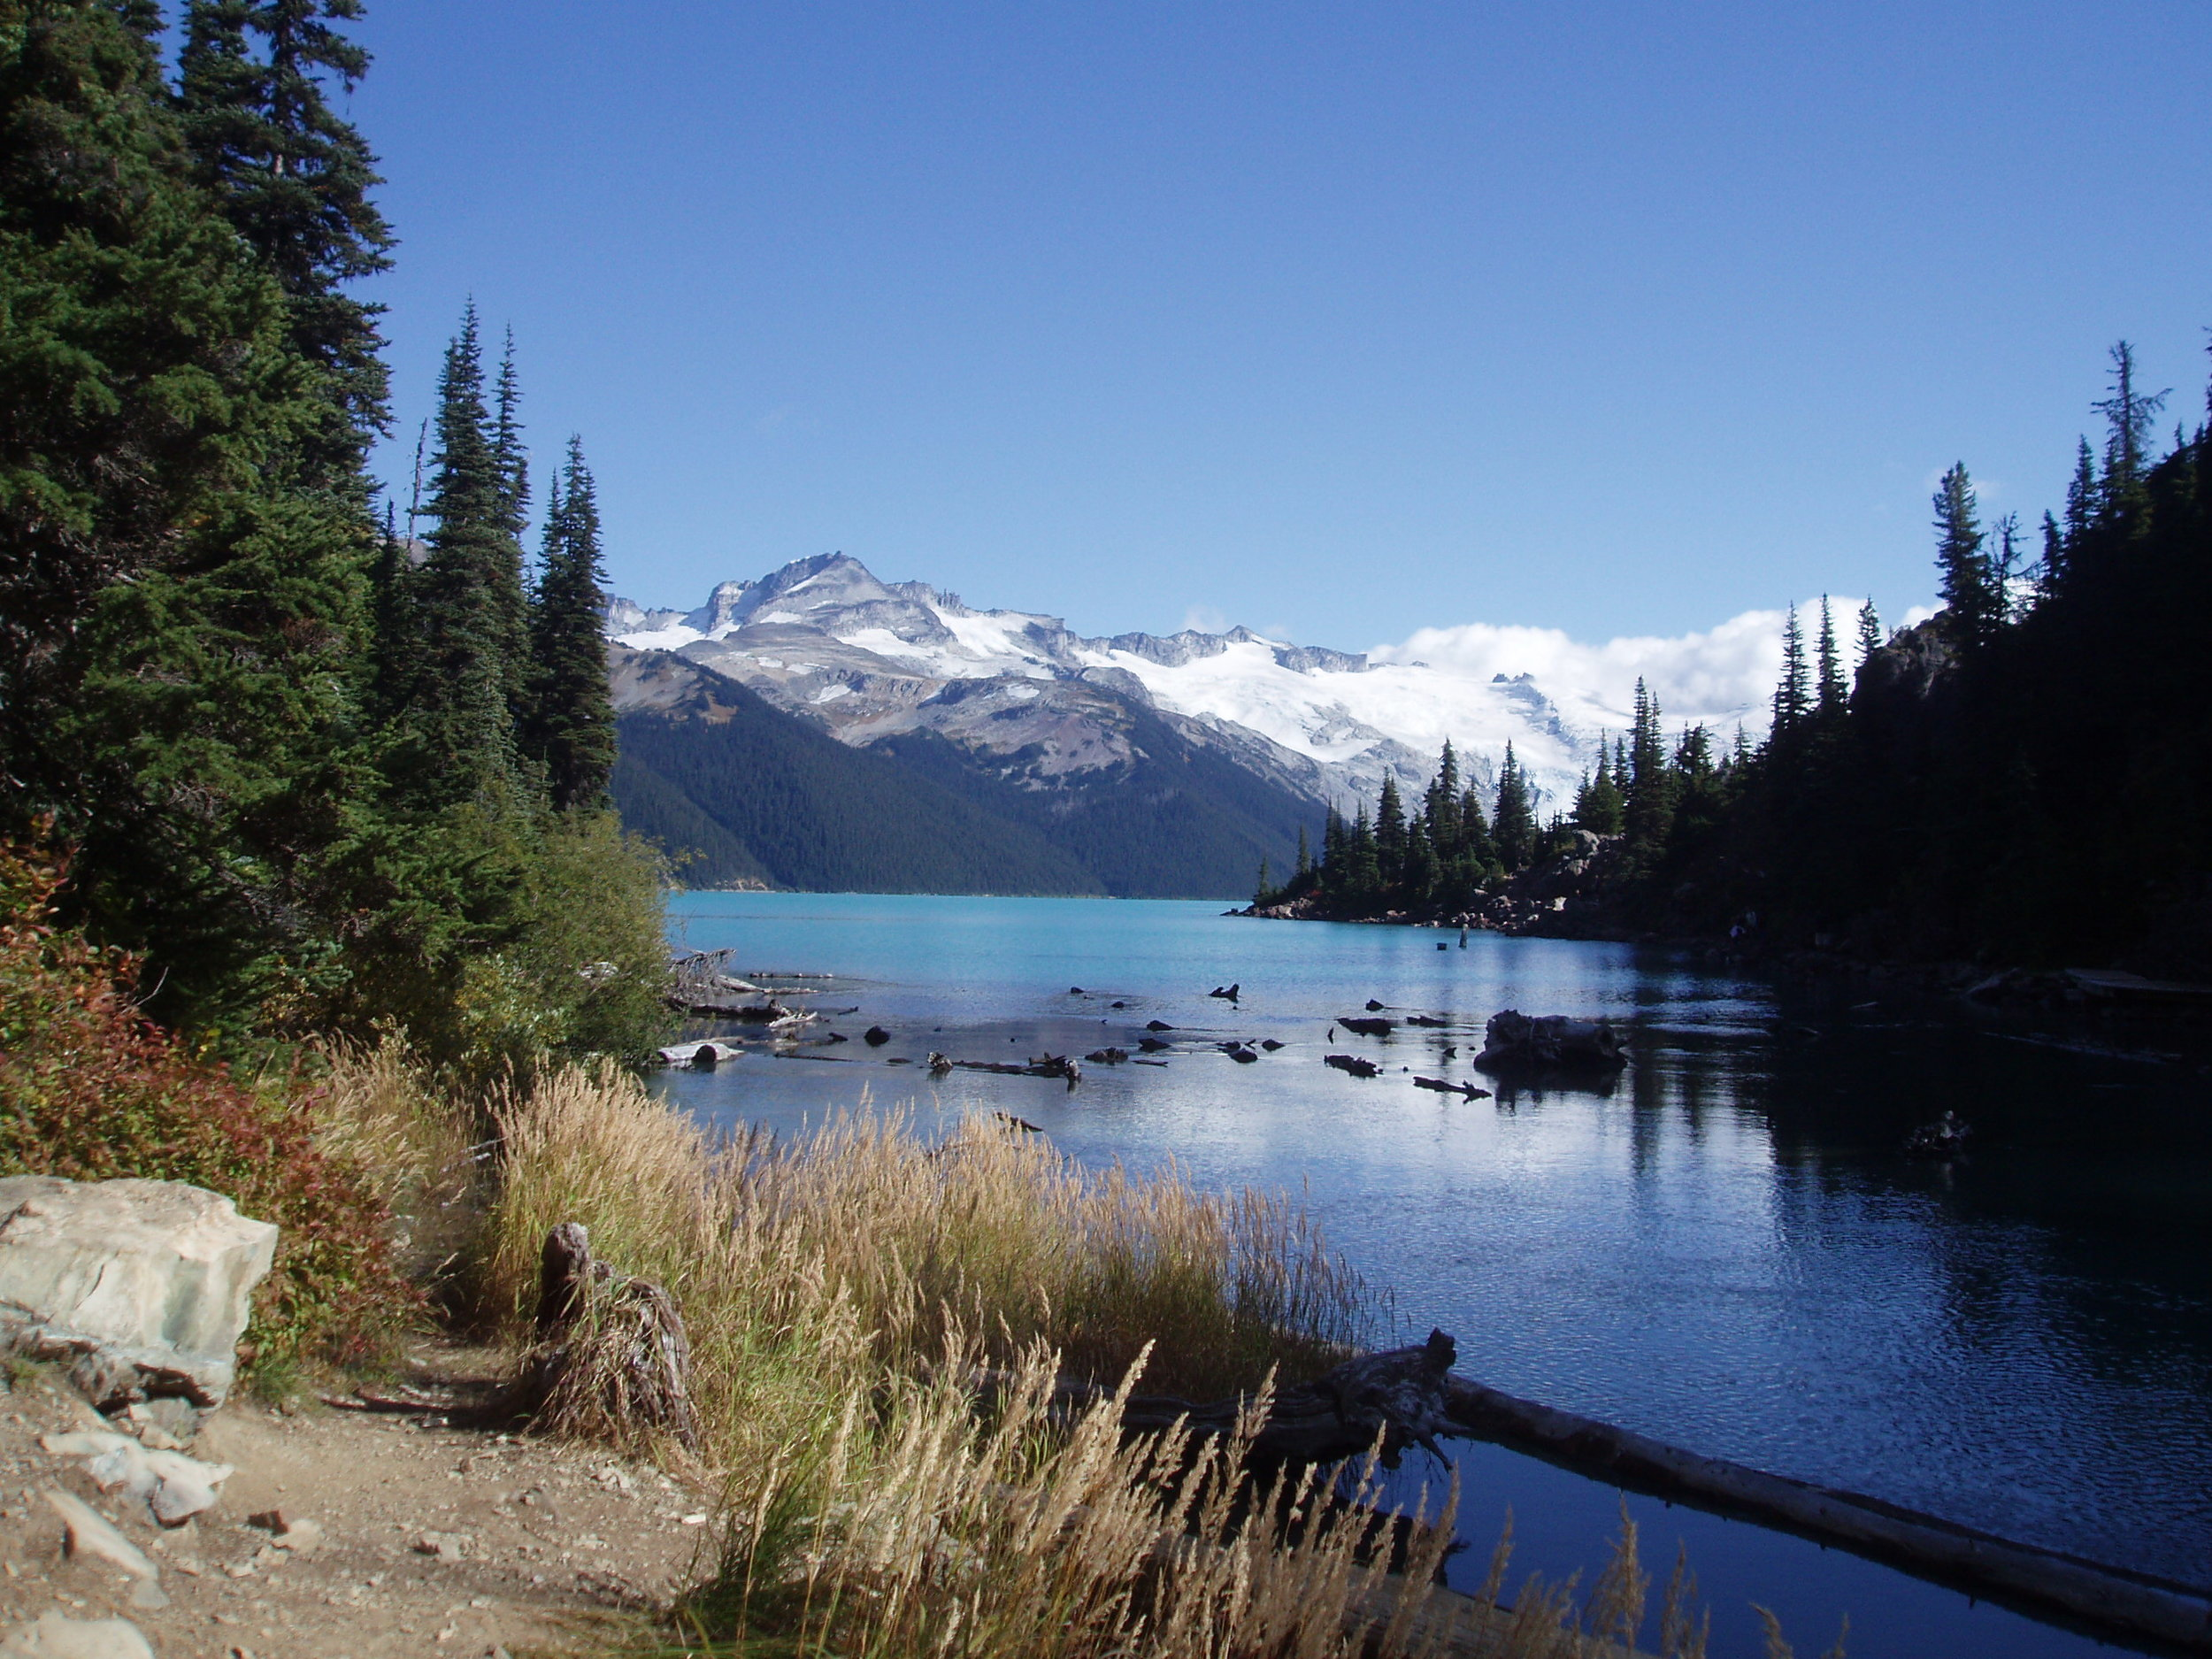 A glimpse of Garibaldi Lake from the trail.